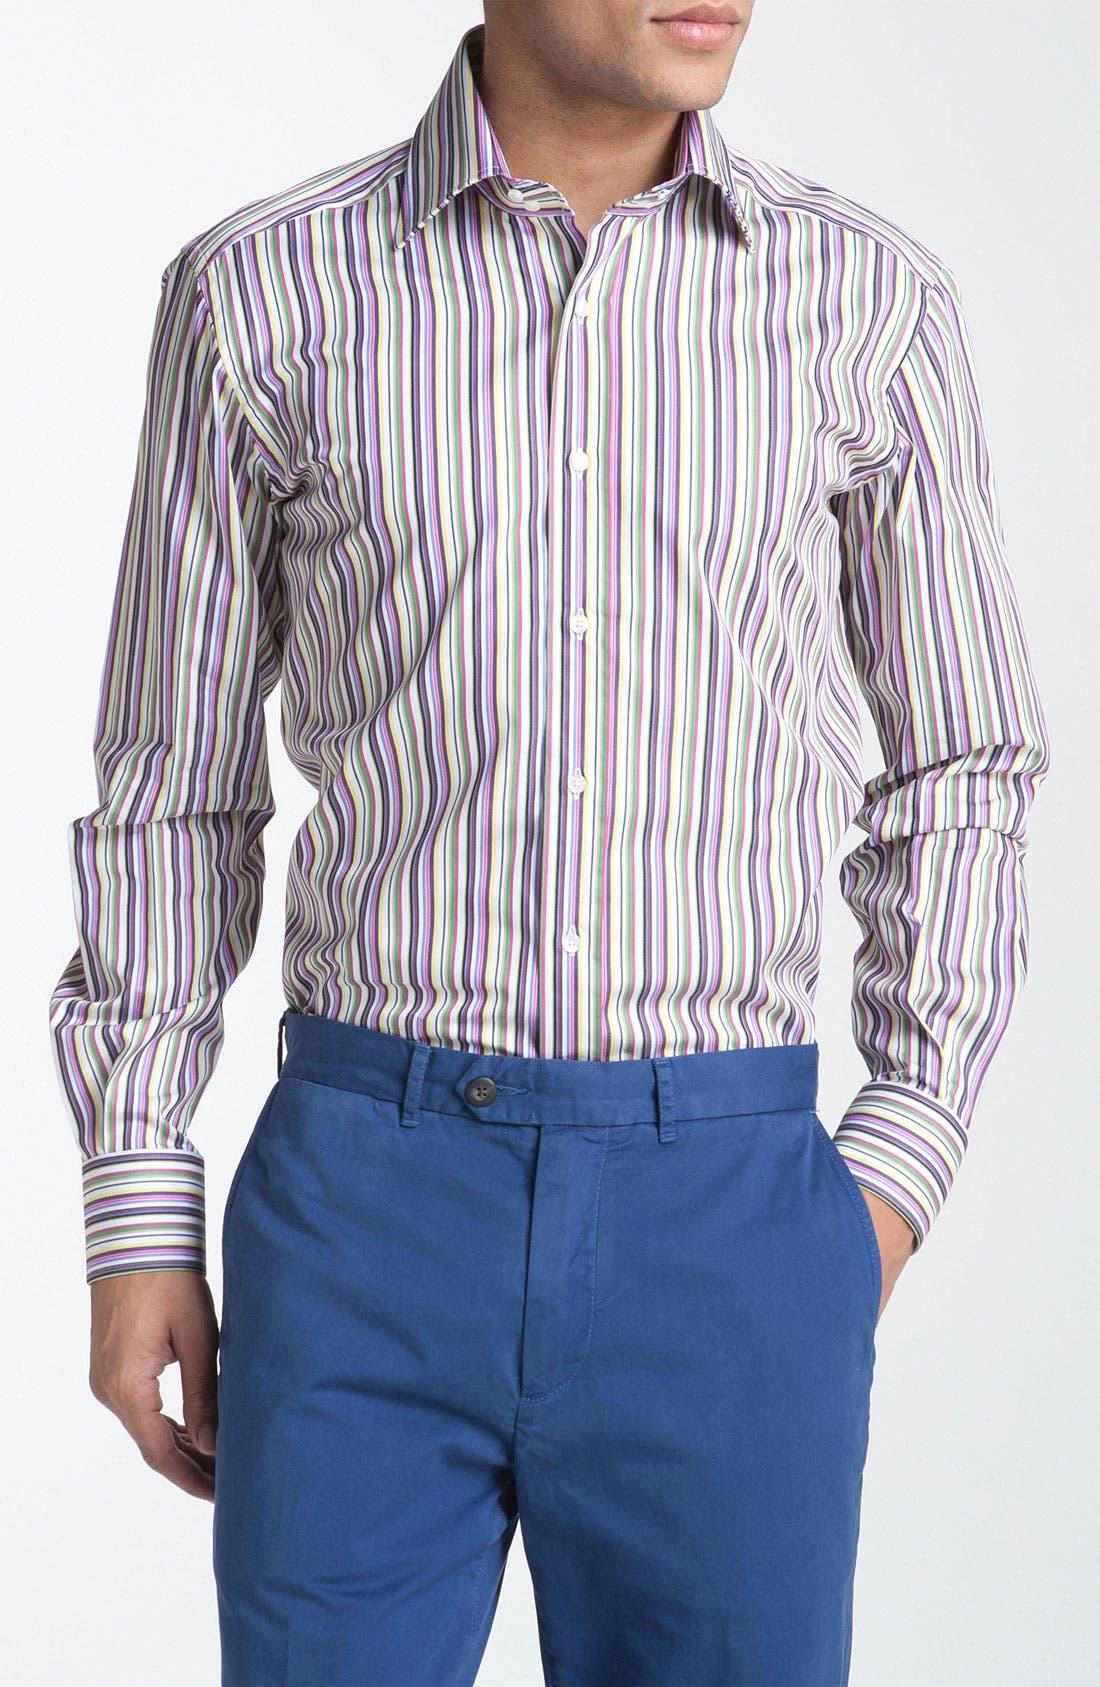 Alternate Image 1 Selected - Etro Stripe Woven Dress Shirt